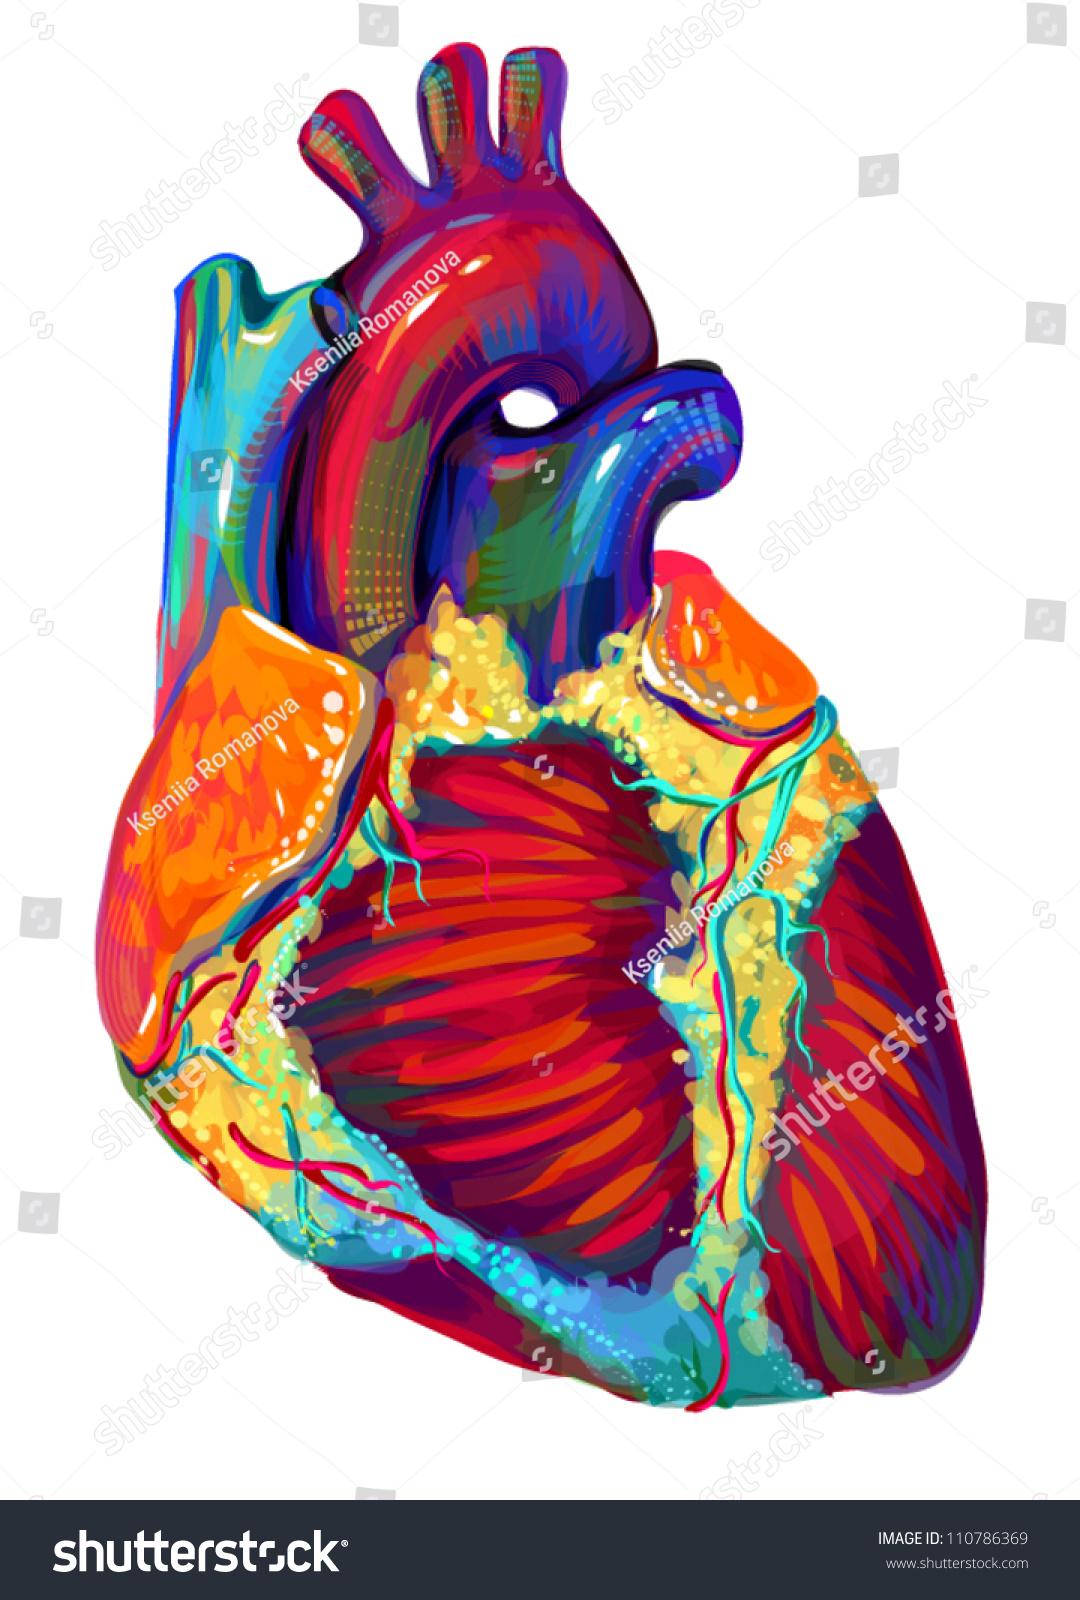 Human Heart Anatomy Art